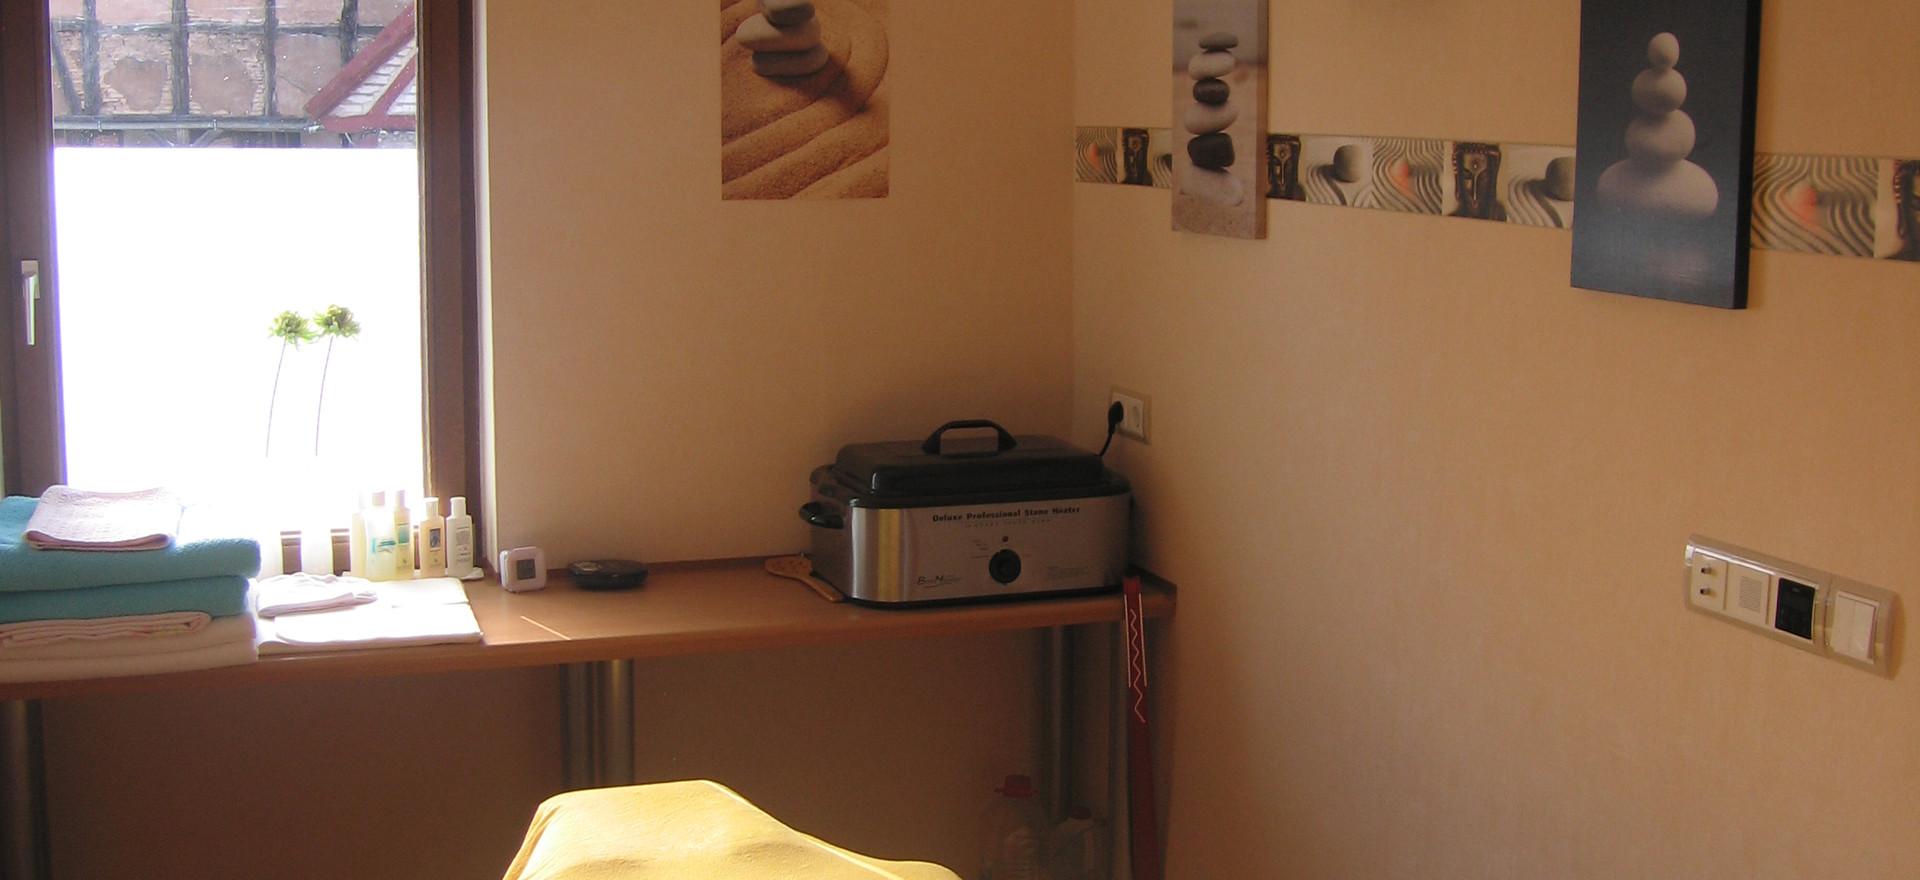 Behandlungsraum HOT STONE